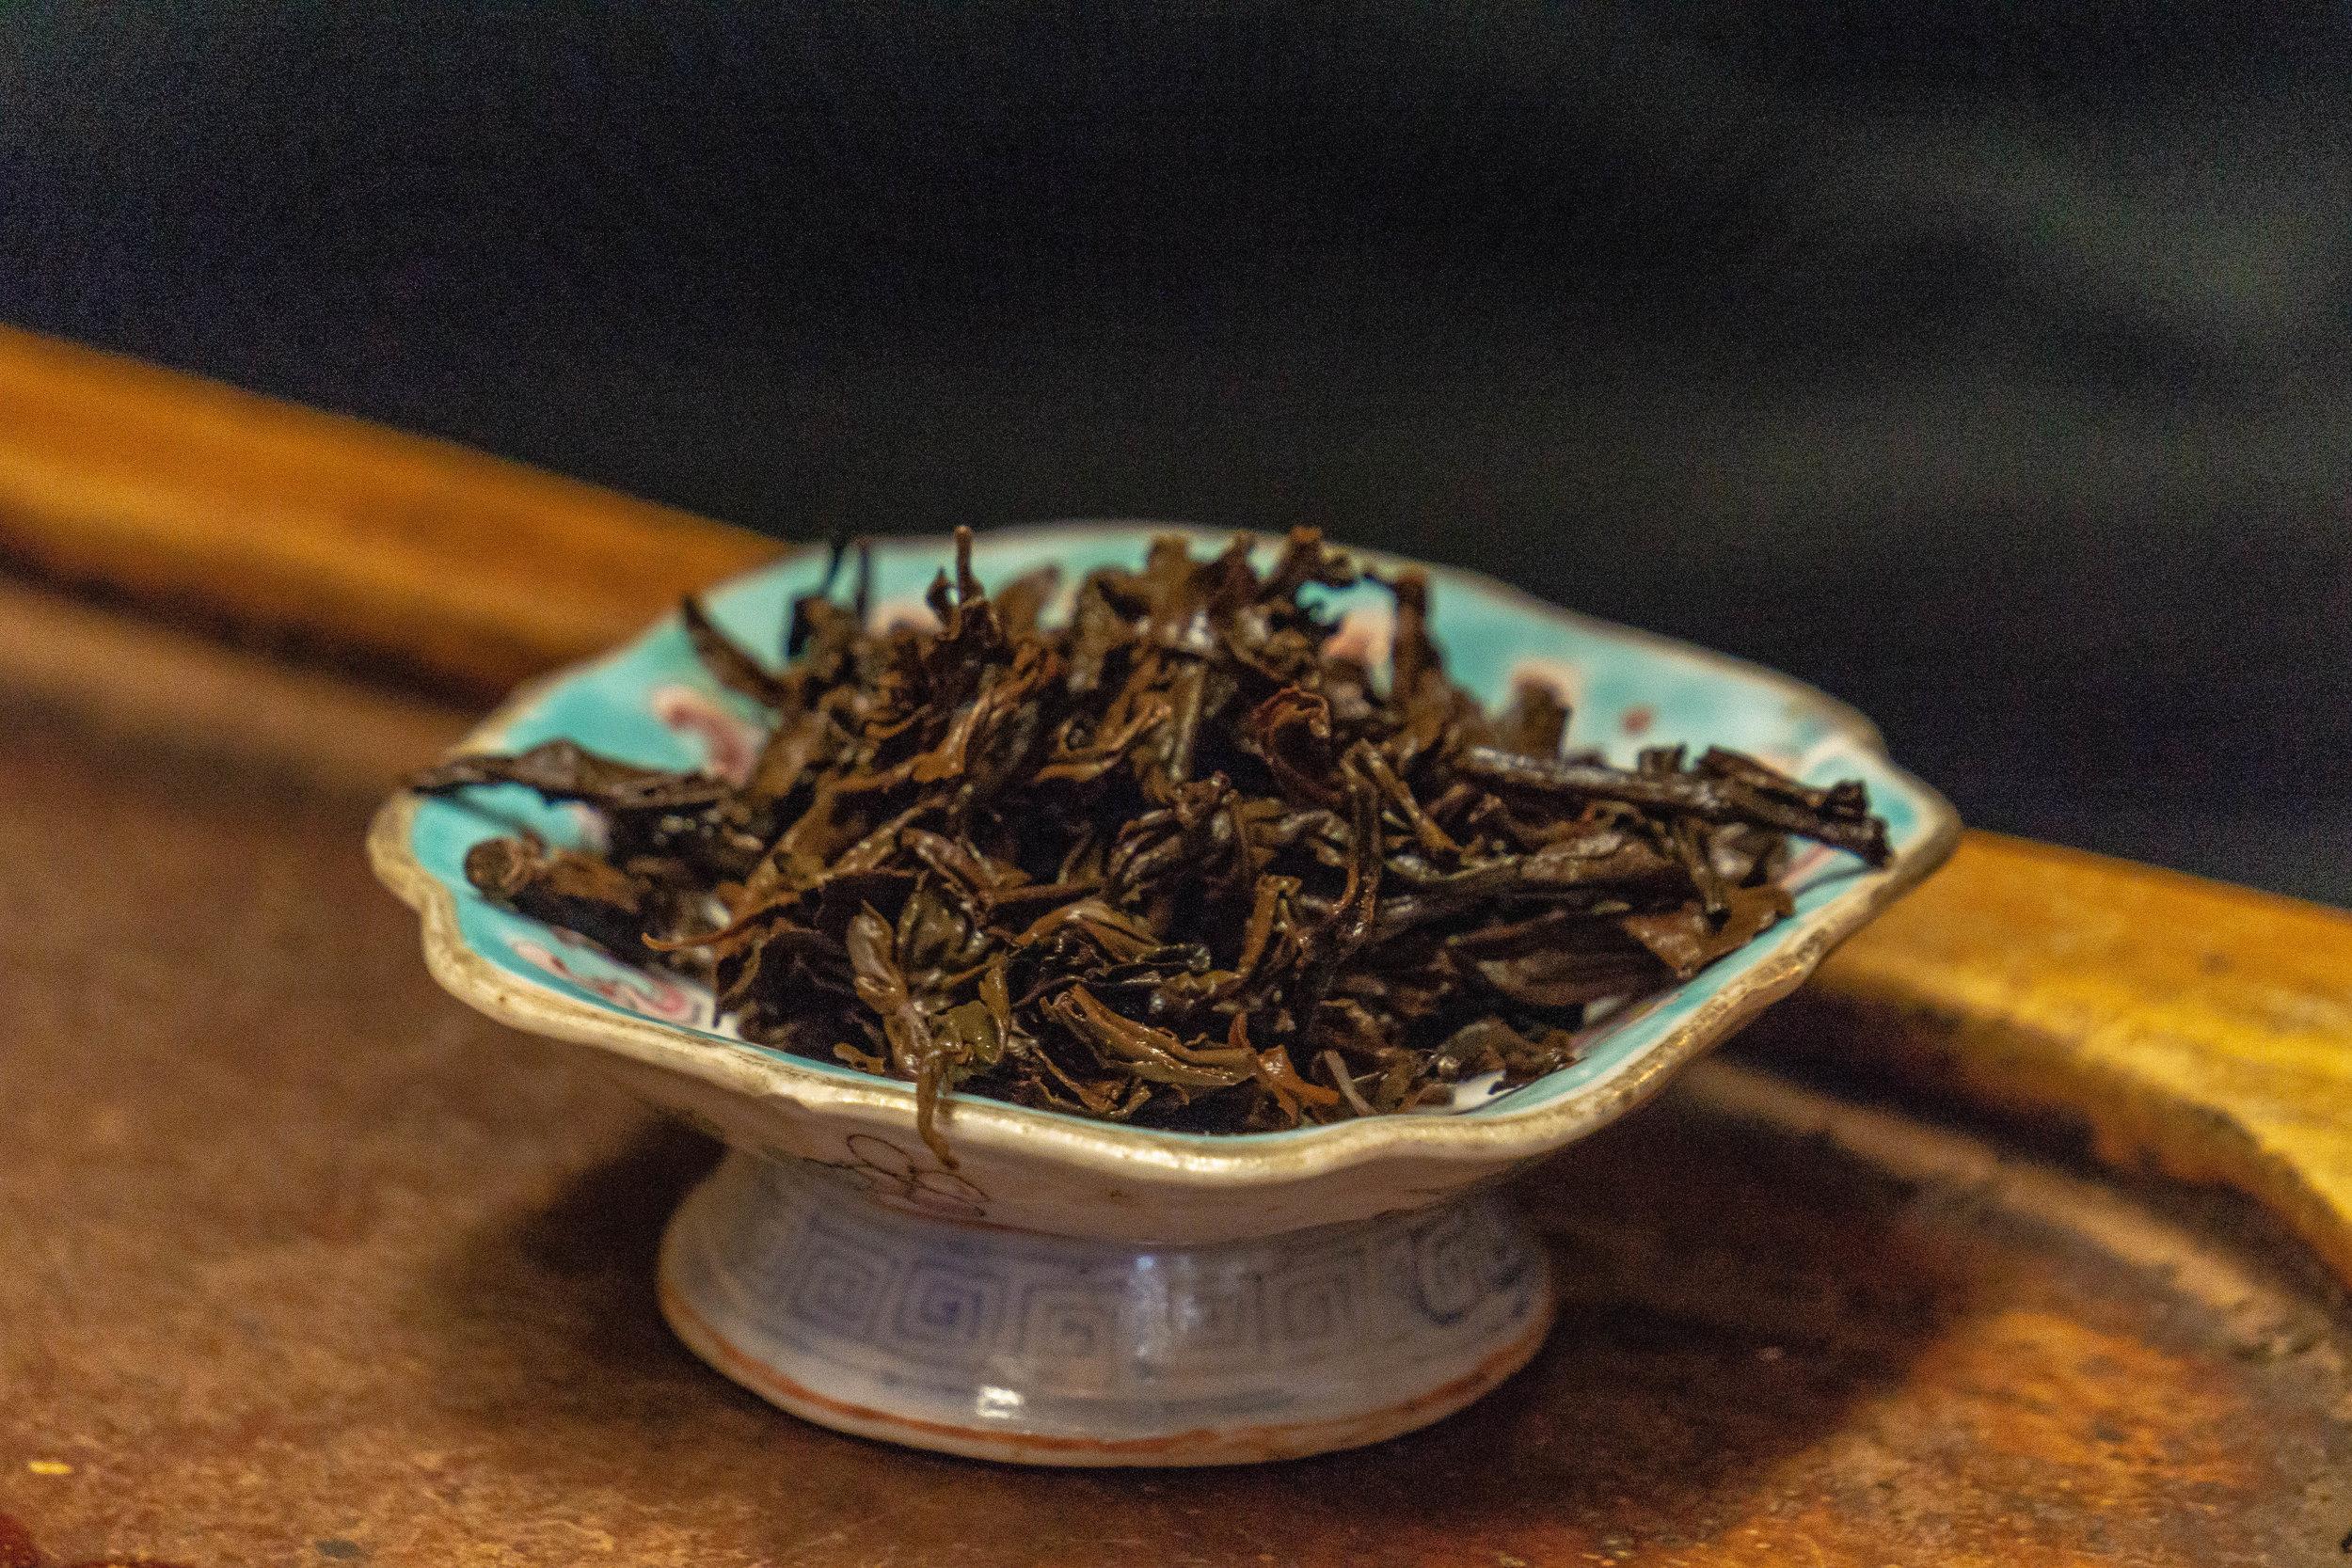 Tea of the month, aged black.  A photo by Dalton Johnson Media,  www.daltonjohnsonmedia.com  or  @daltonjohnsonmedia